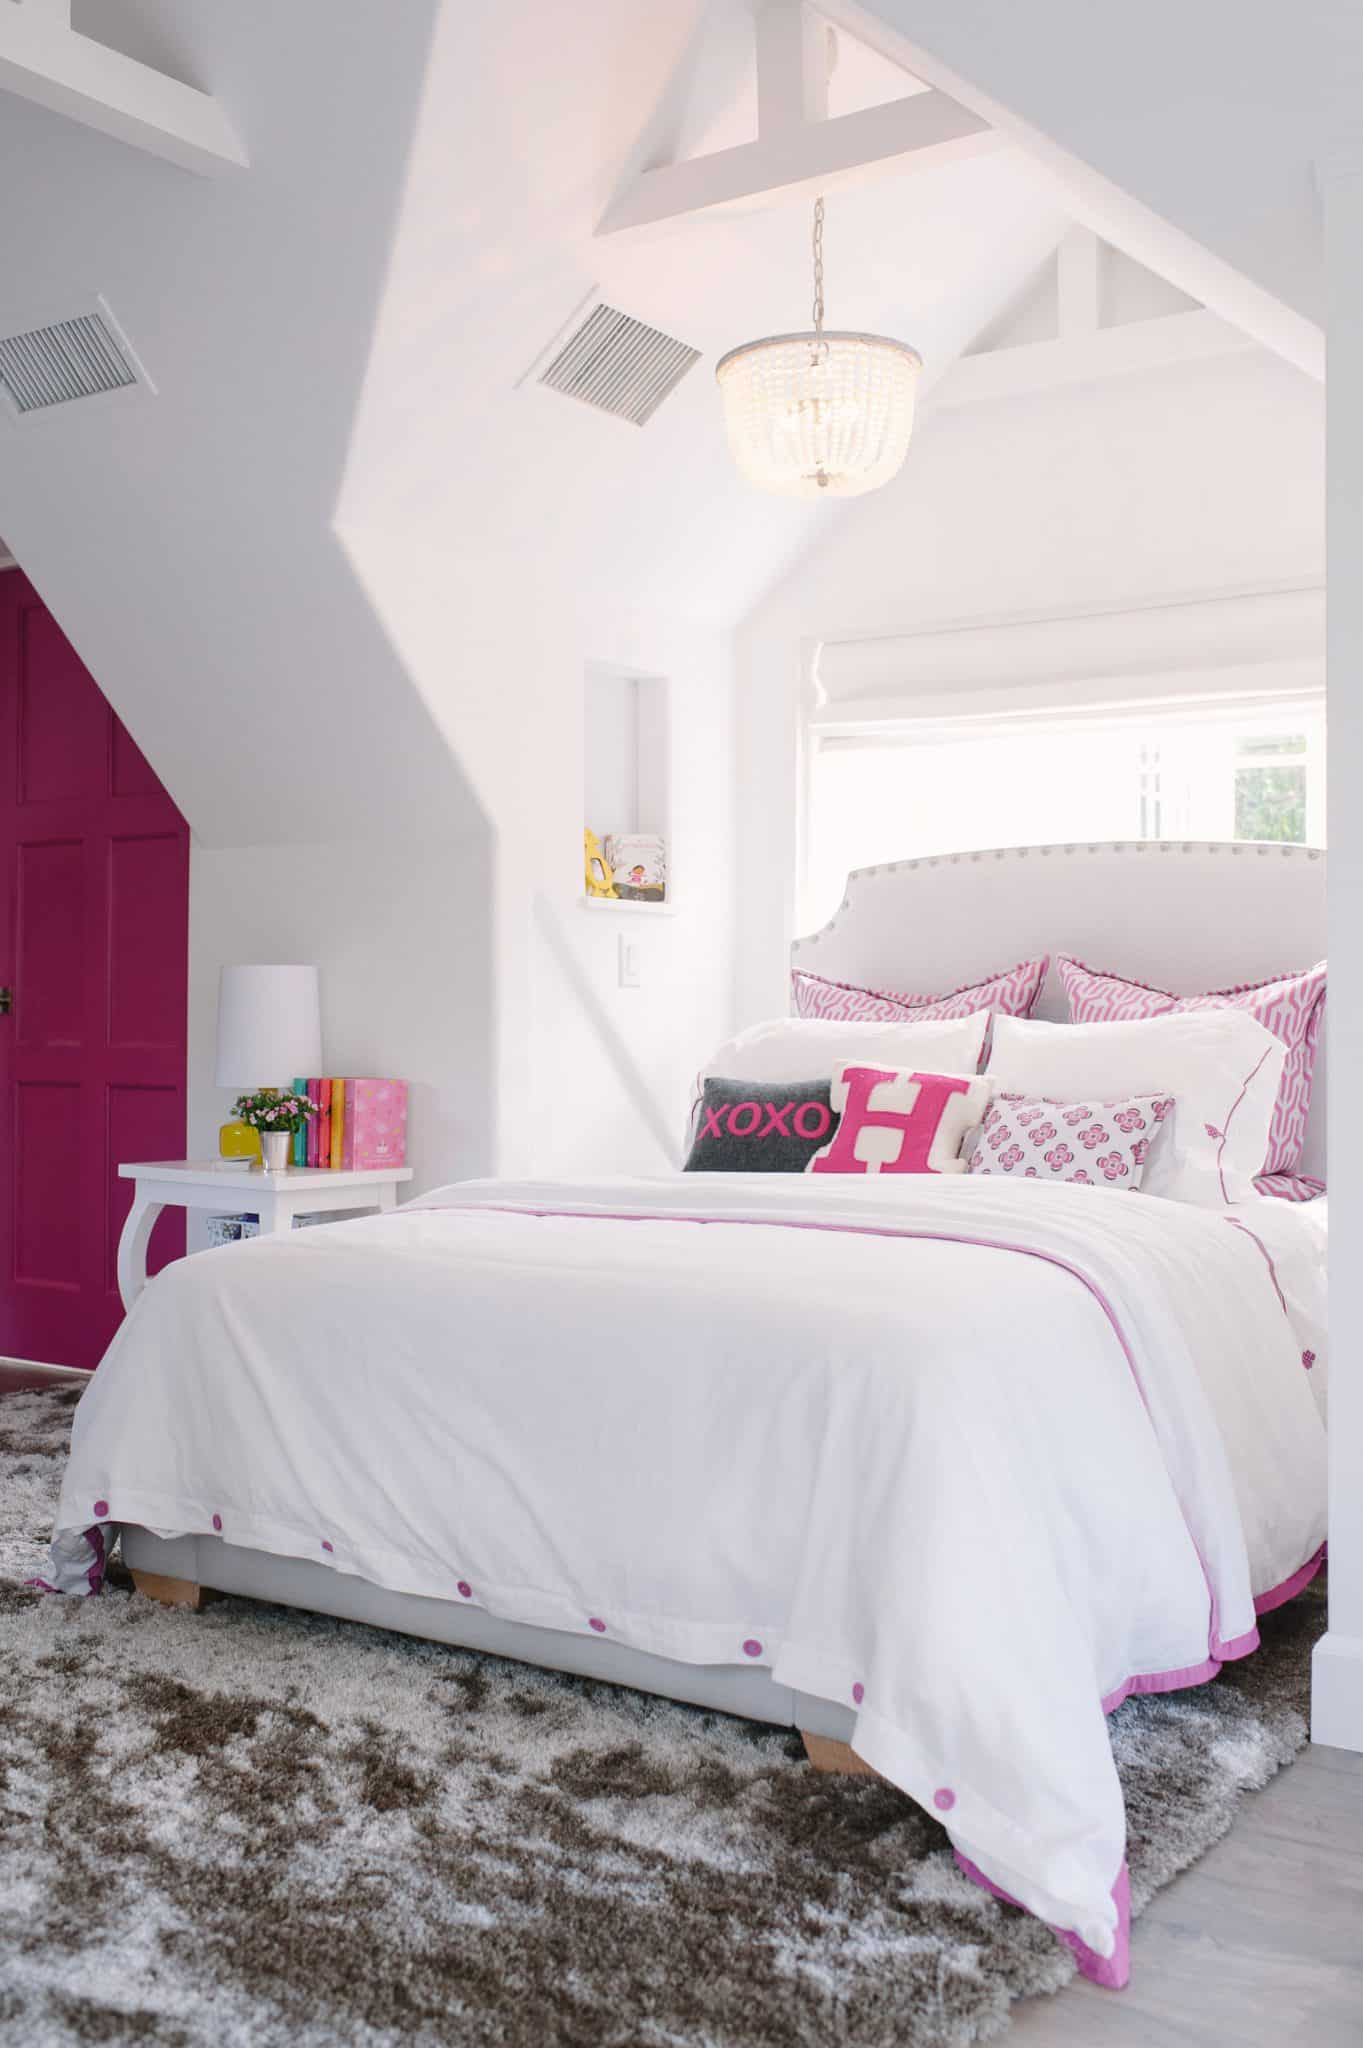 Harper Smith bedroom by Tiffani Thiessen